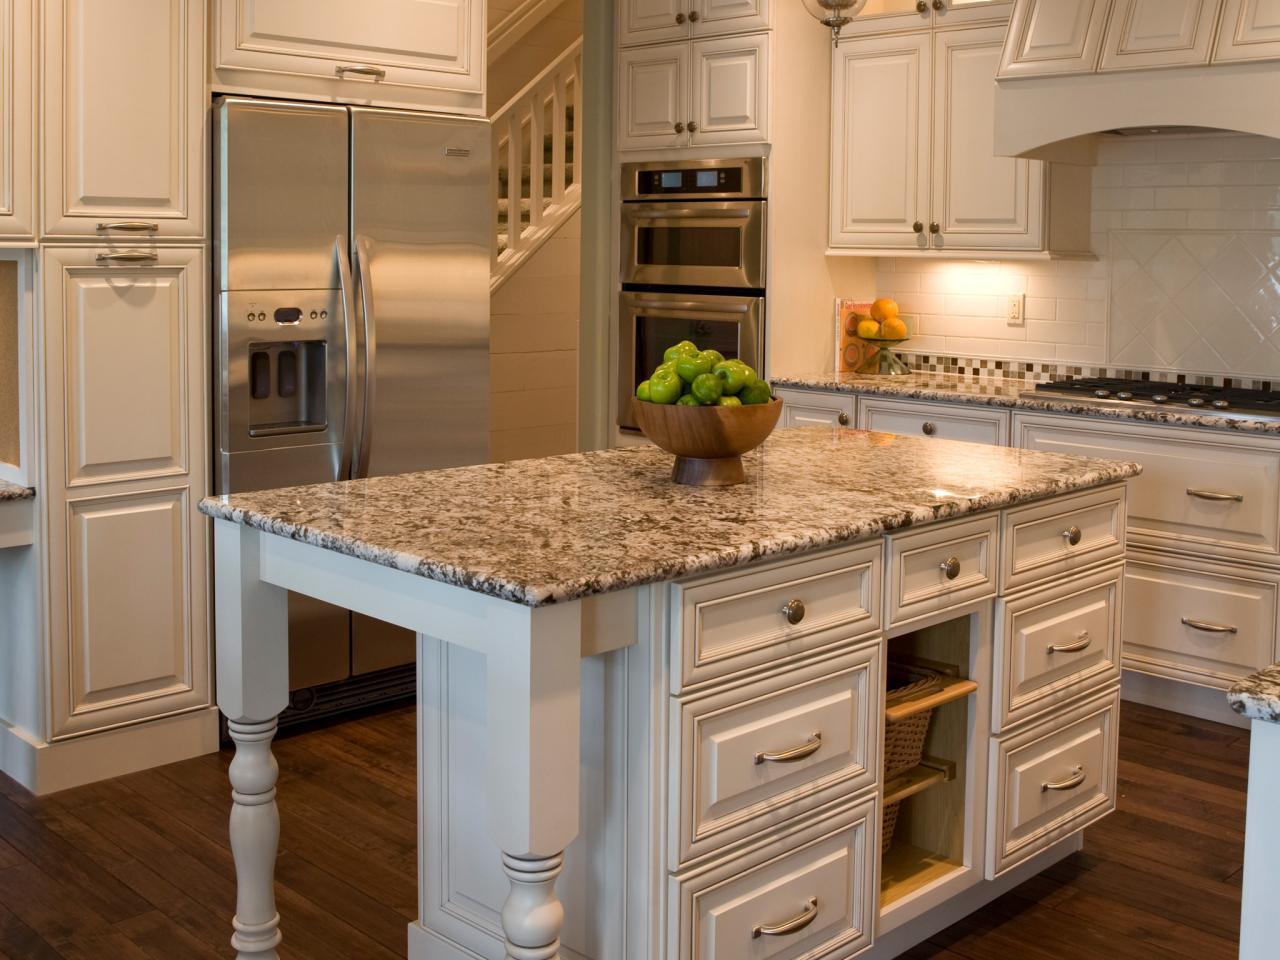 granite kitchen designs pictures photo - 3